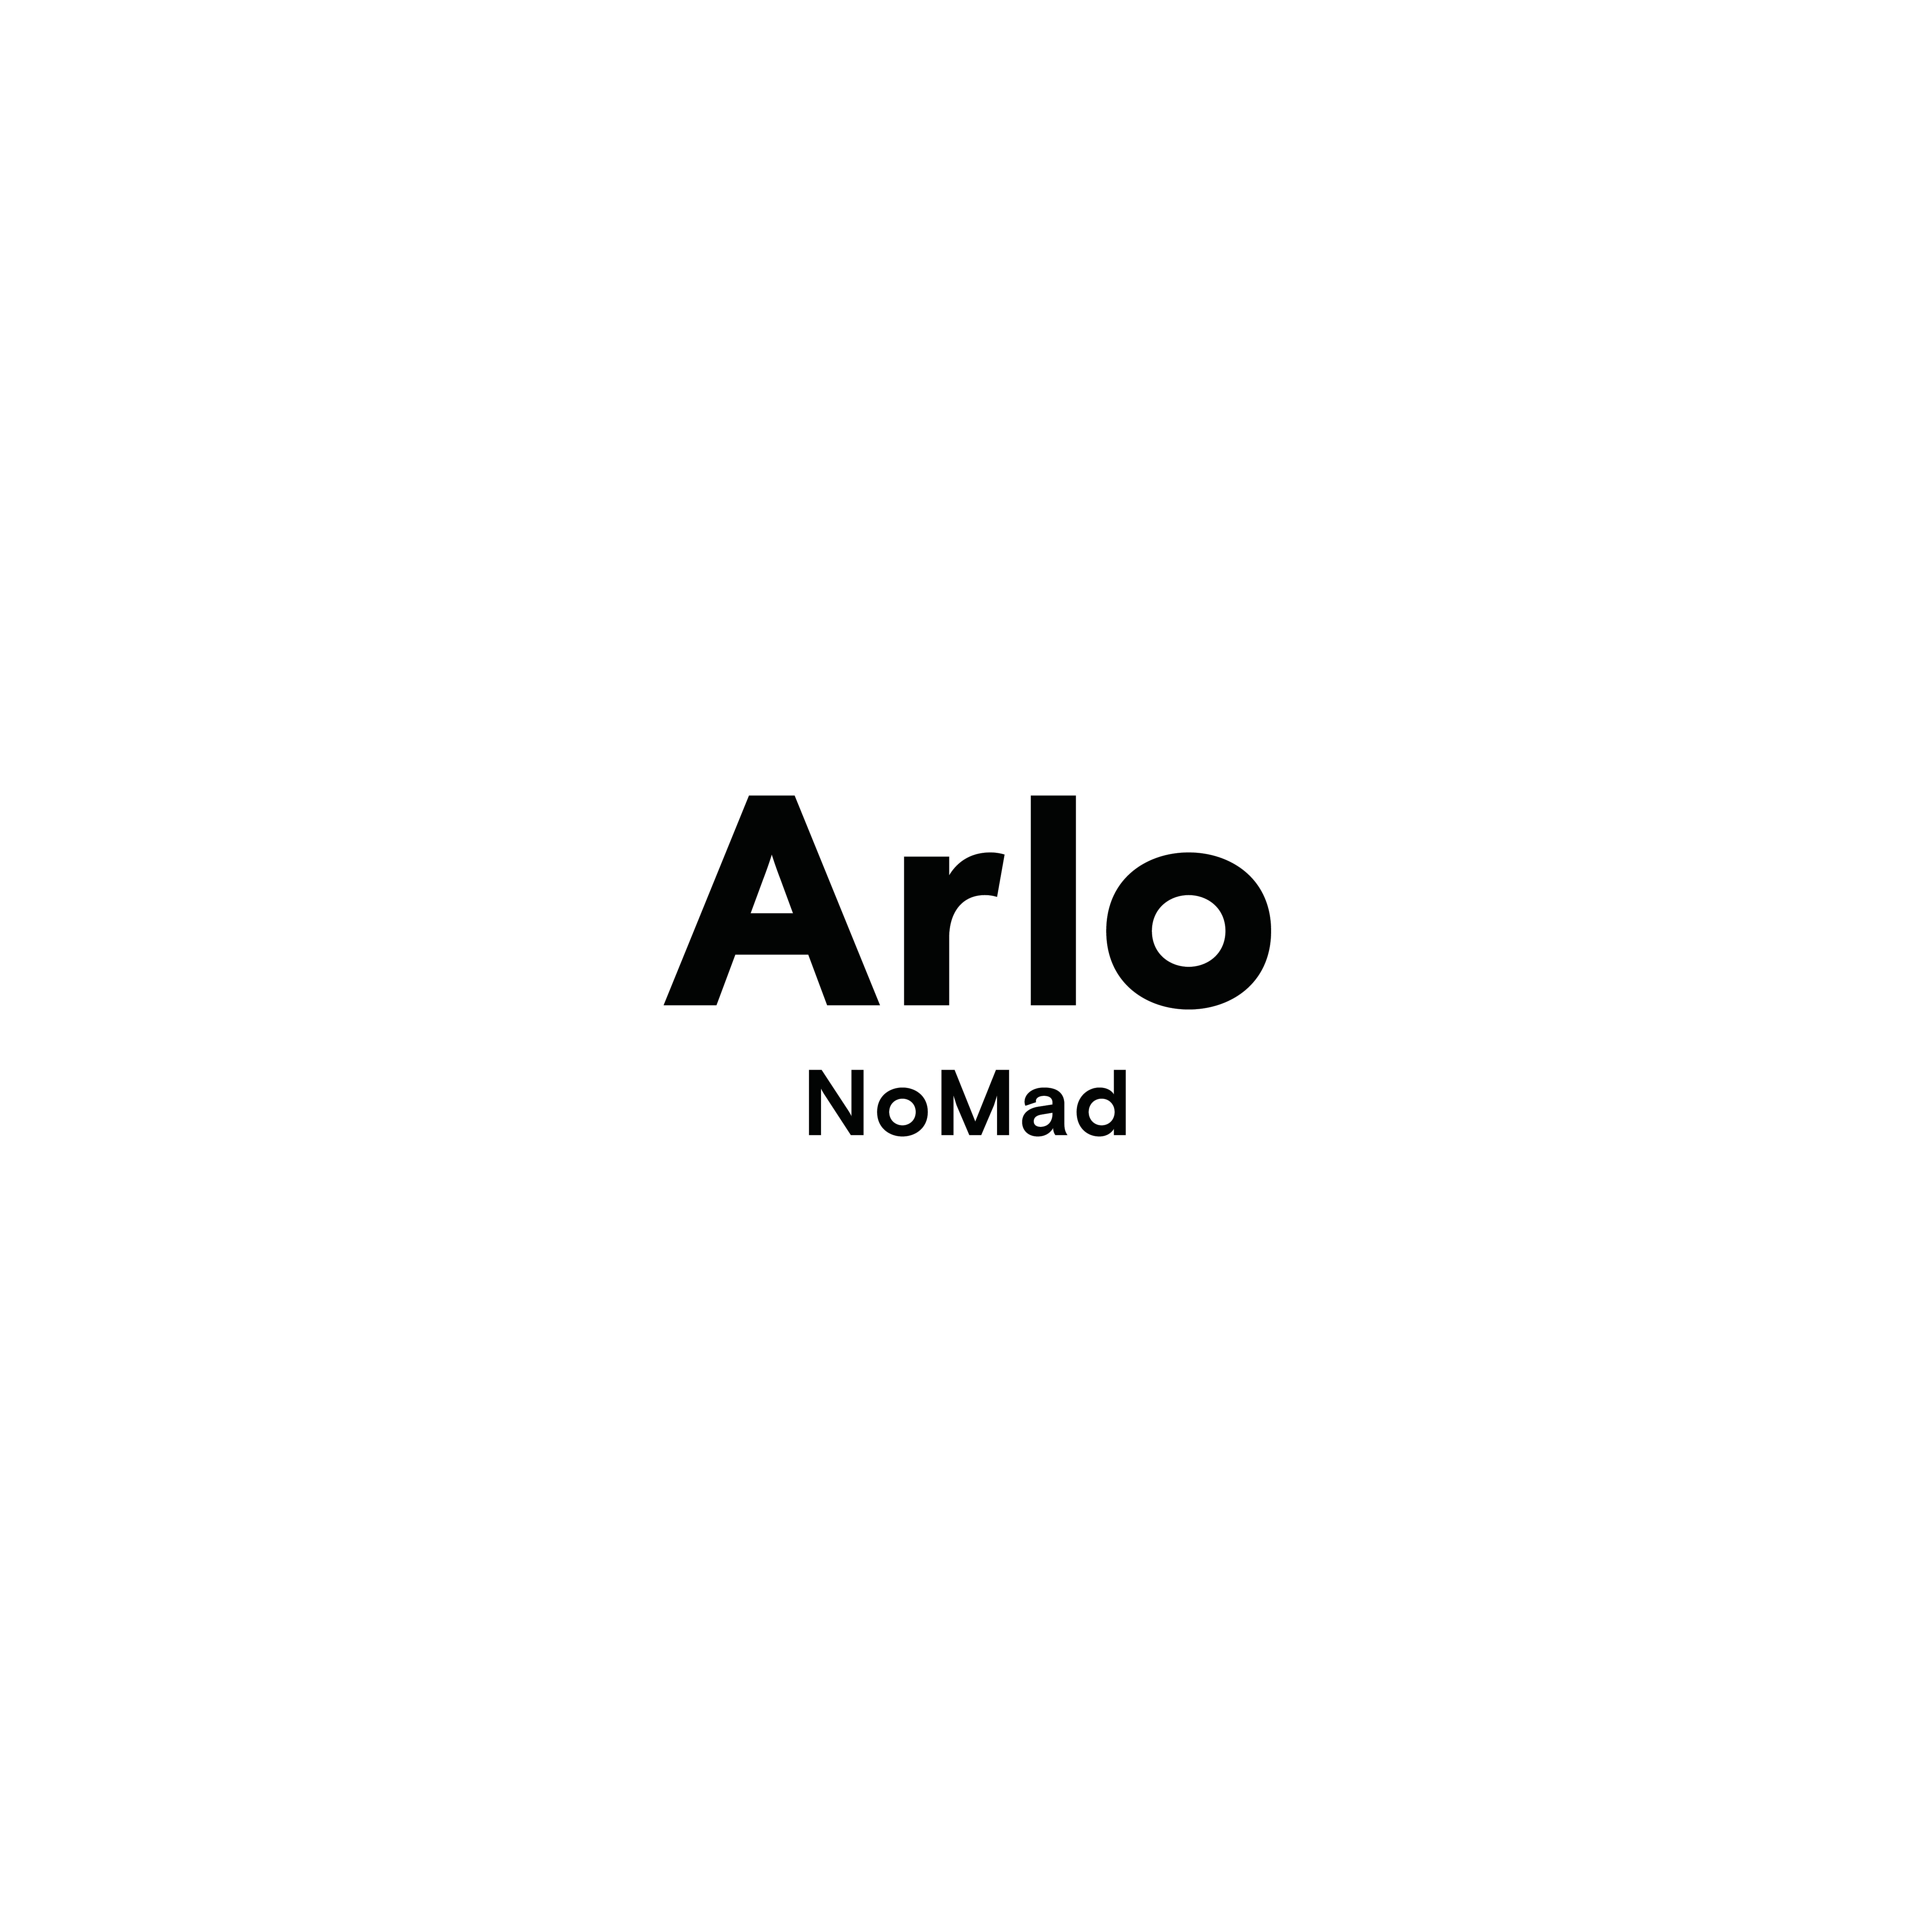 Arlo NoMad